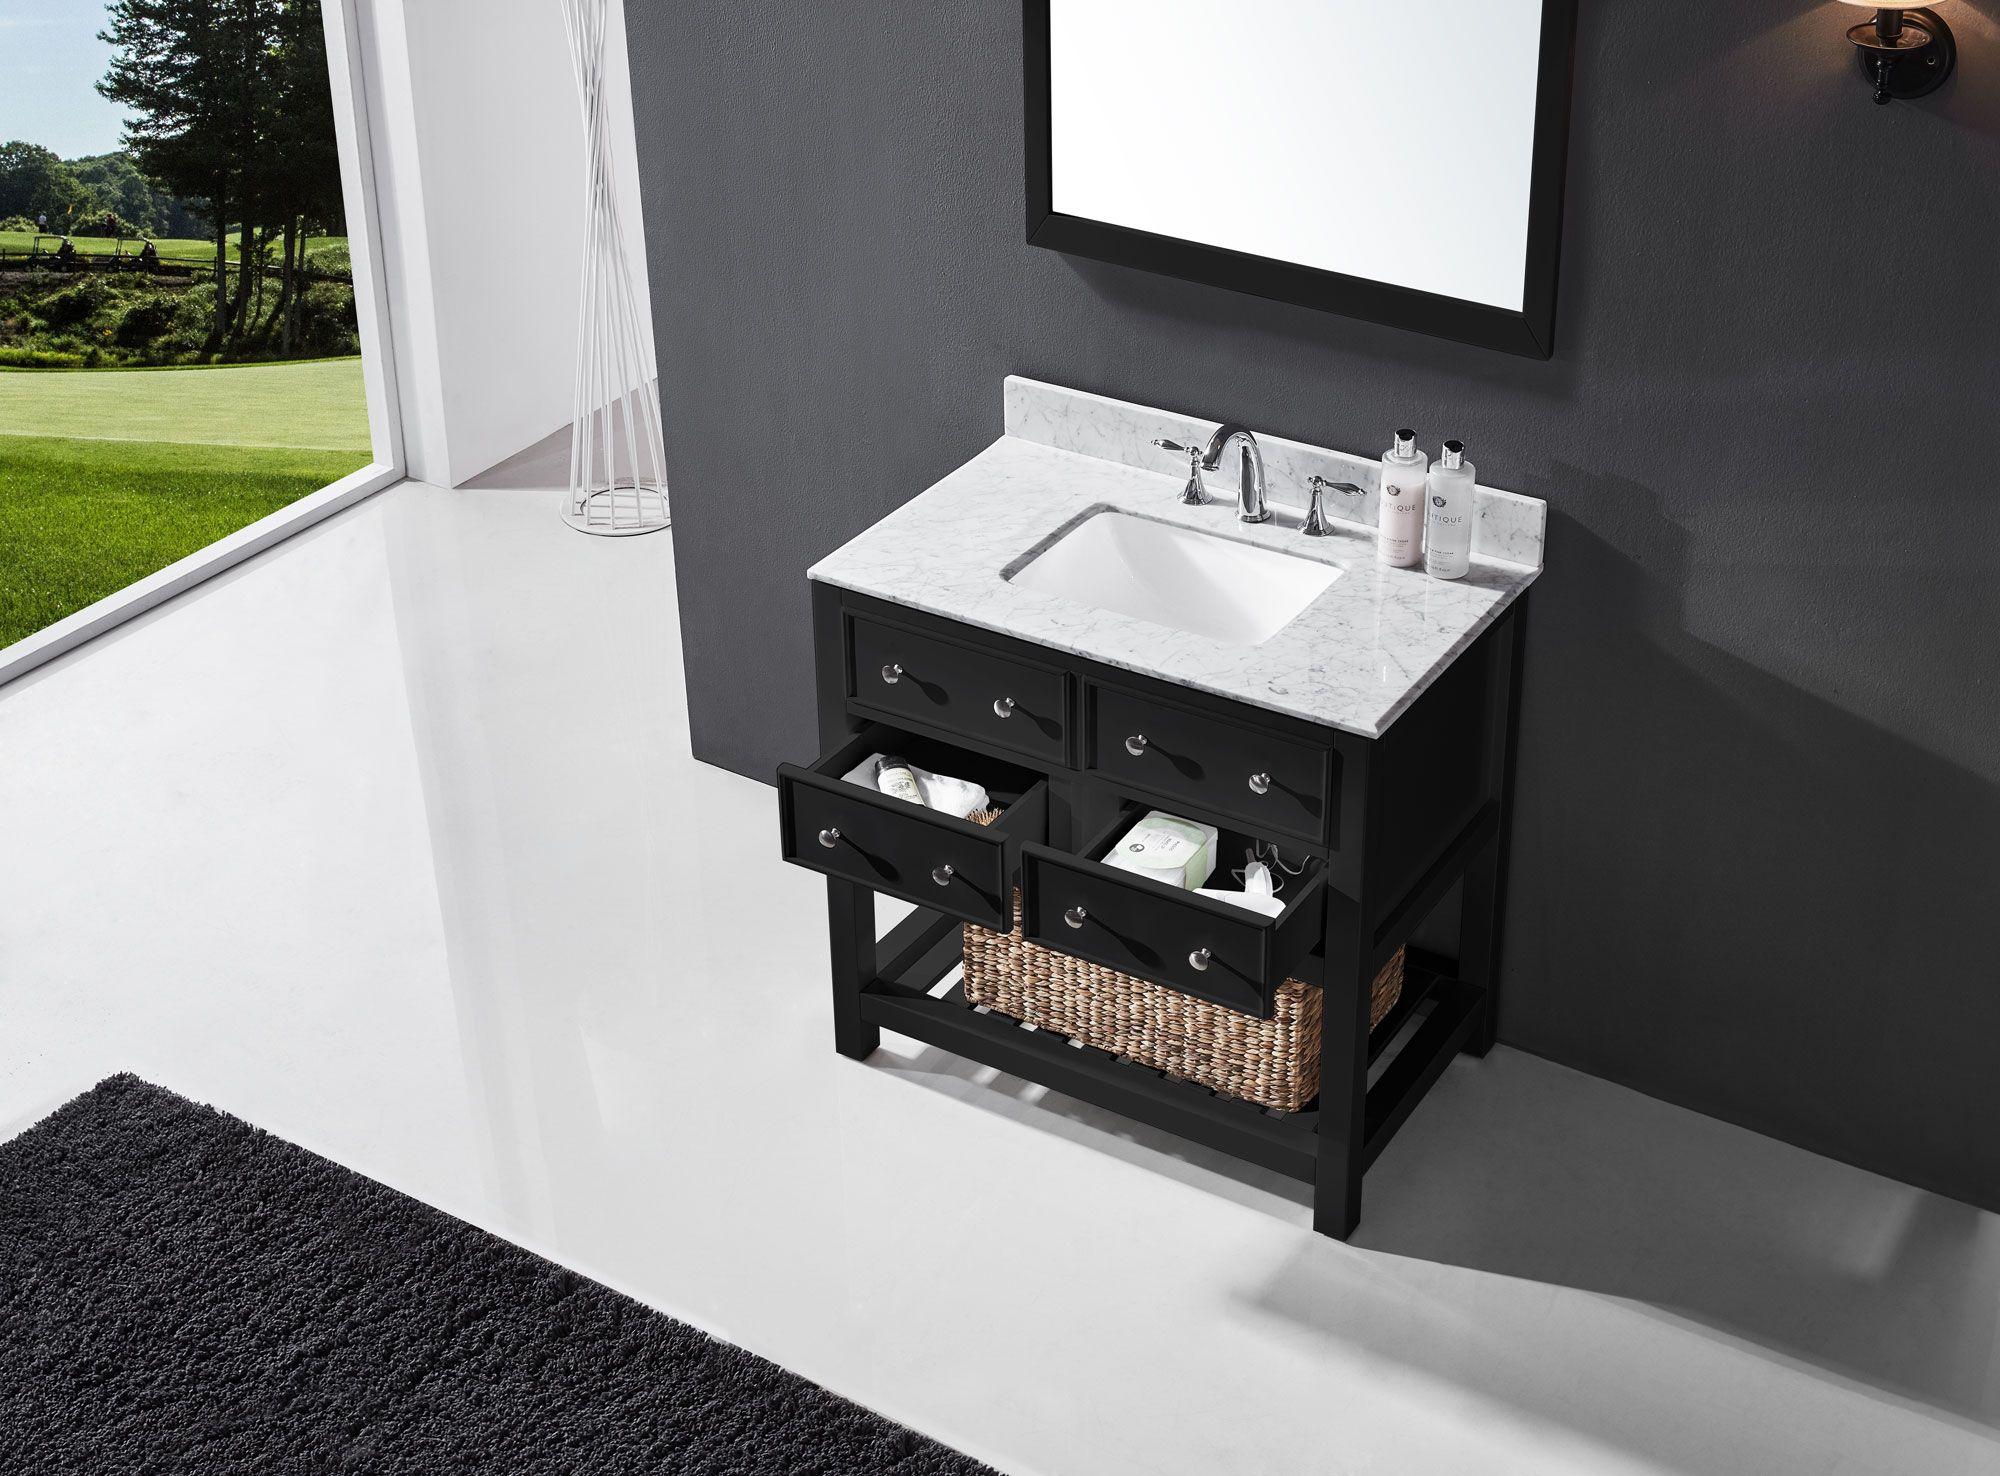 Exclusive Heritage Elodie 36 Single Sink Bathroom Vanity In Espresso With White Carrara Marble Top Bas Single Sink Bathroom Vanity Bathroom Vanity Mirror Set